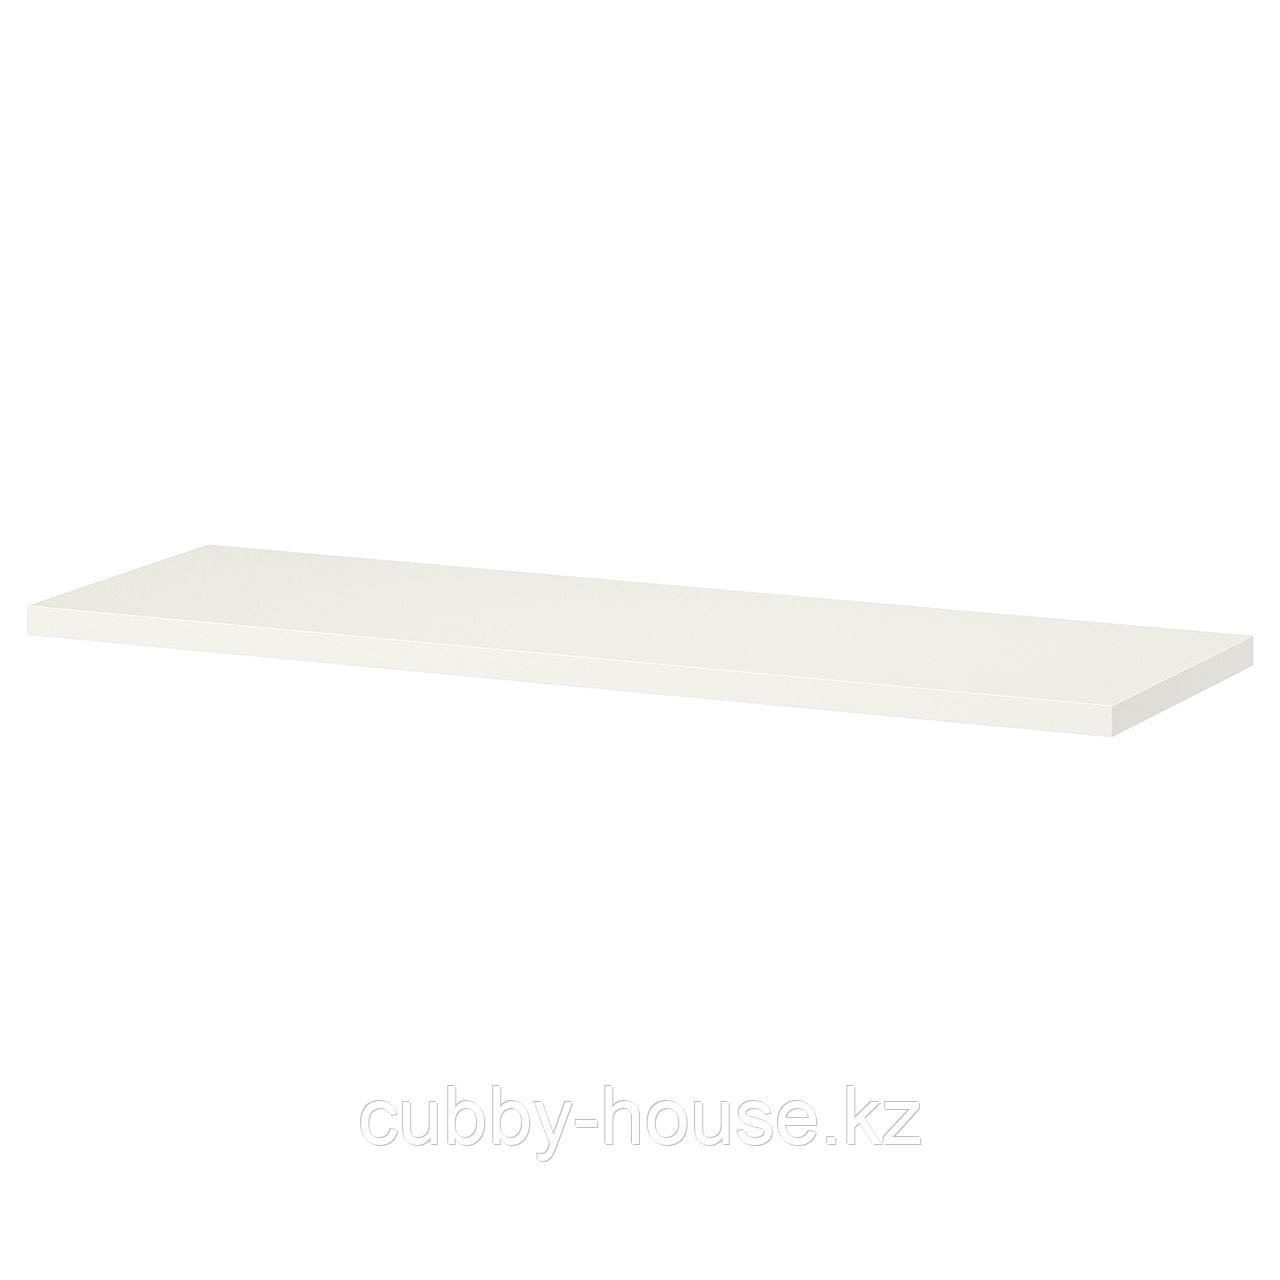 БУРГУЛЬТ Полка, белый, 59x20 см